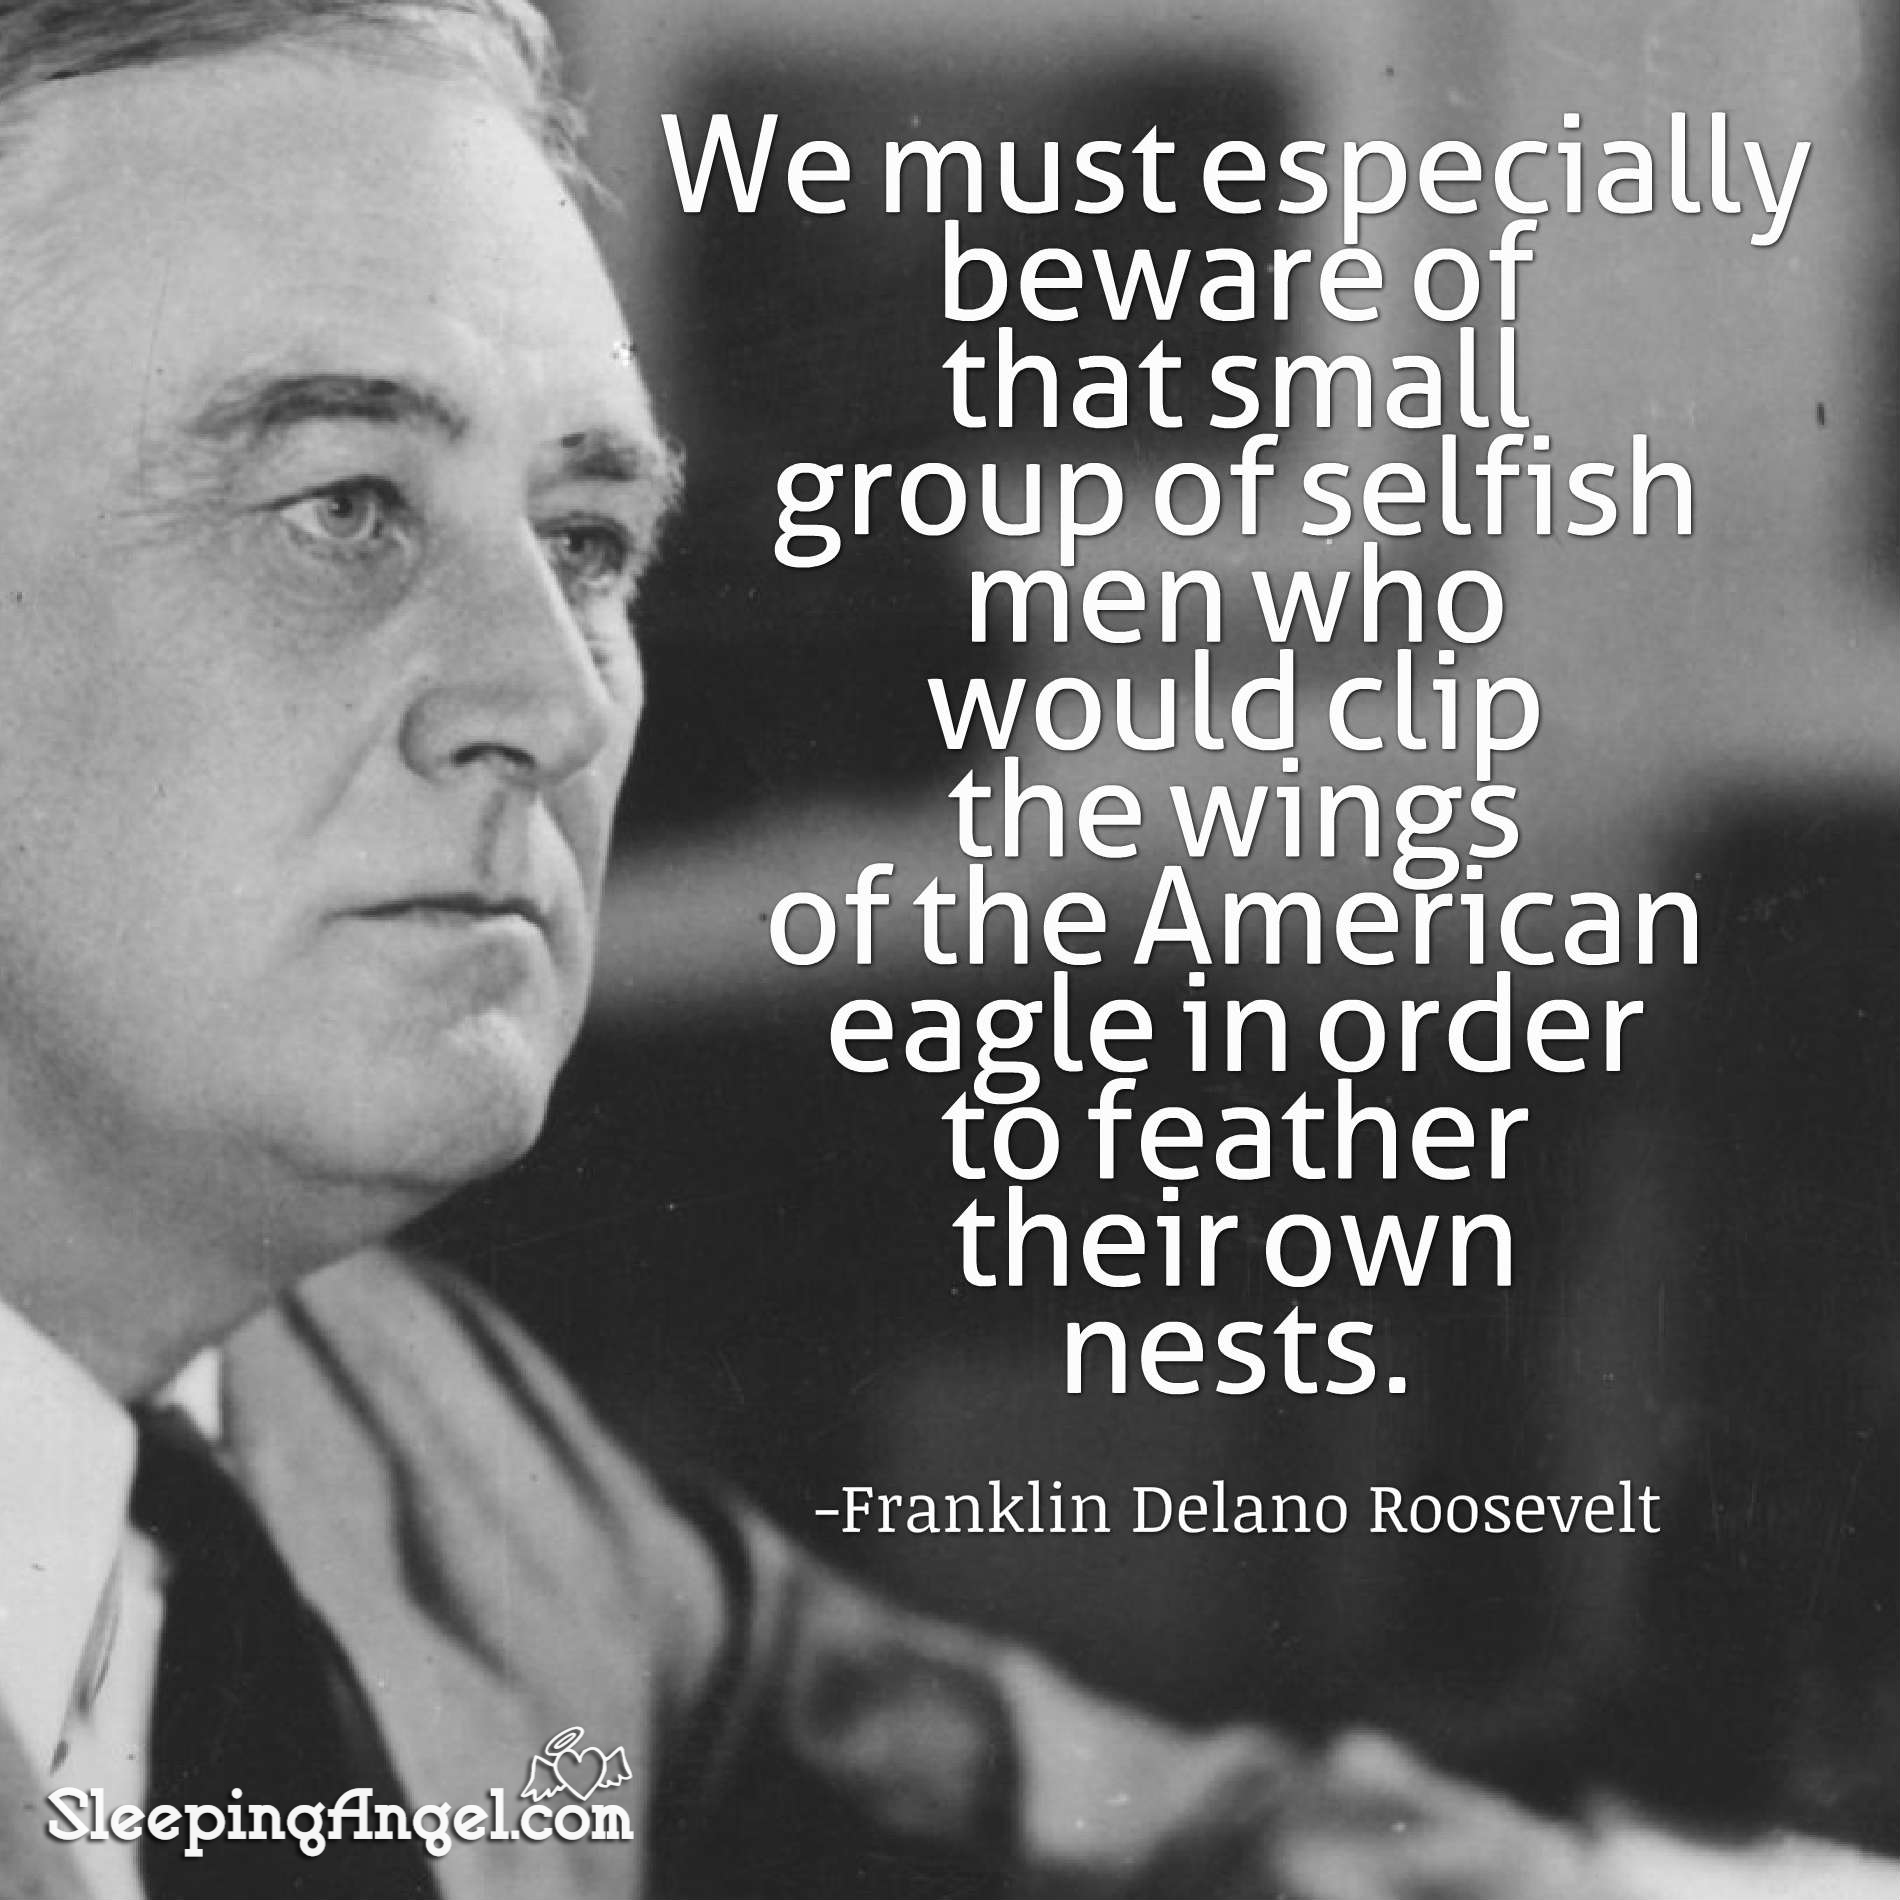 Franklin D Roosevelt Quotes Franklin Delano Roosevelt Quote  Sleeping Angel